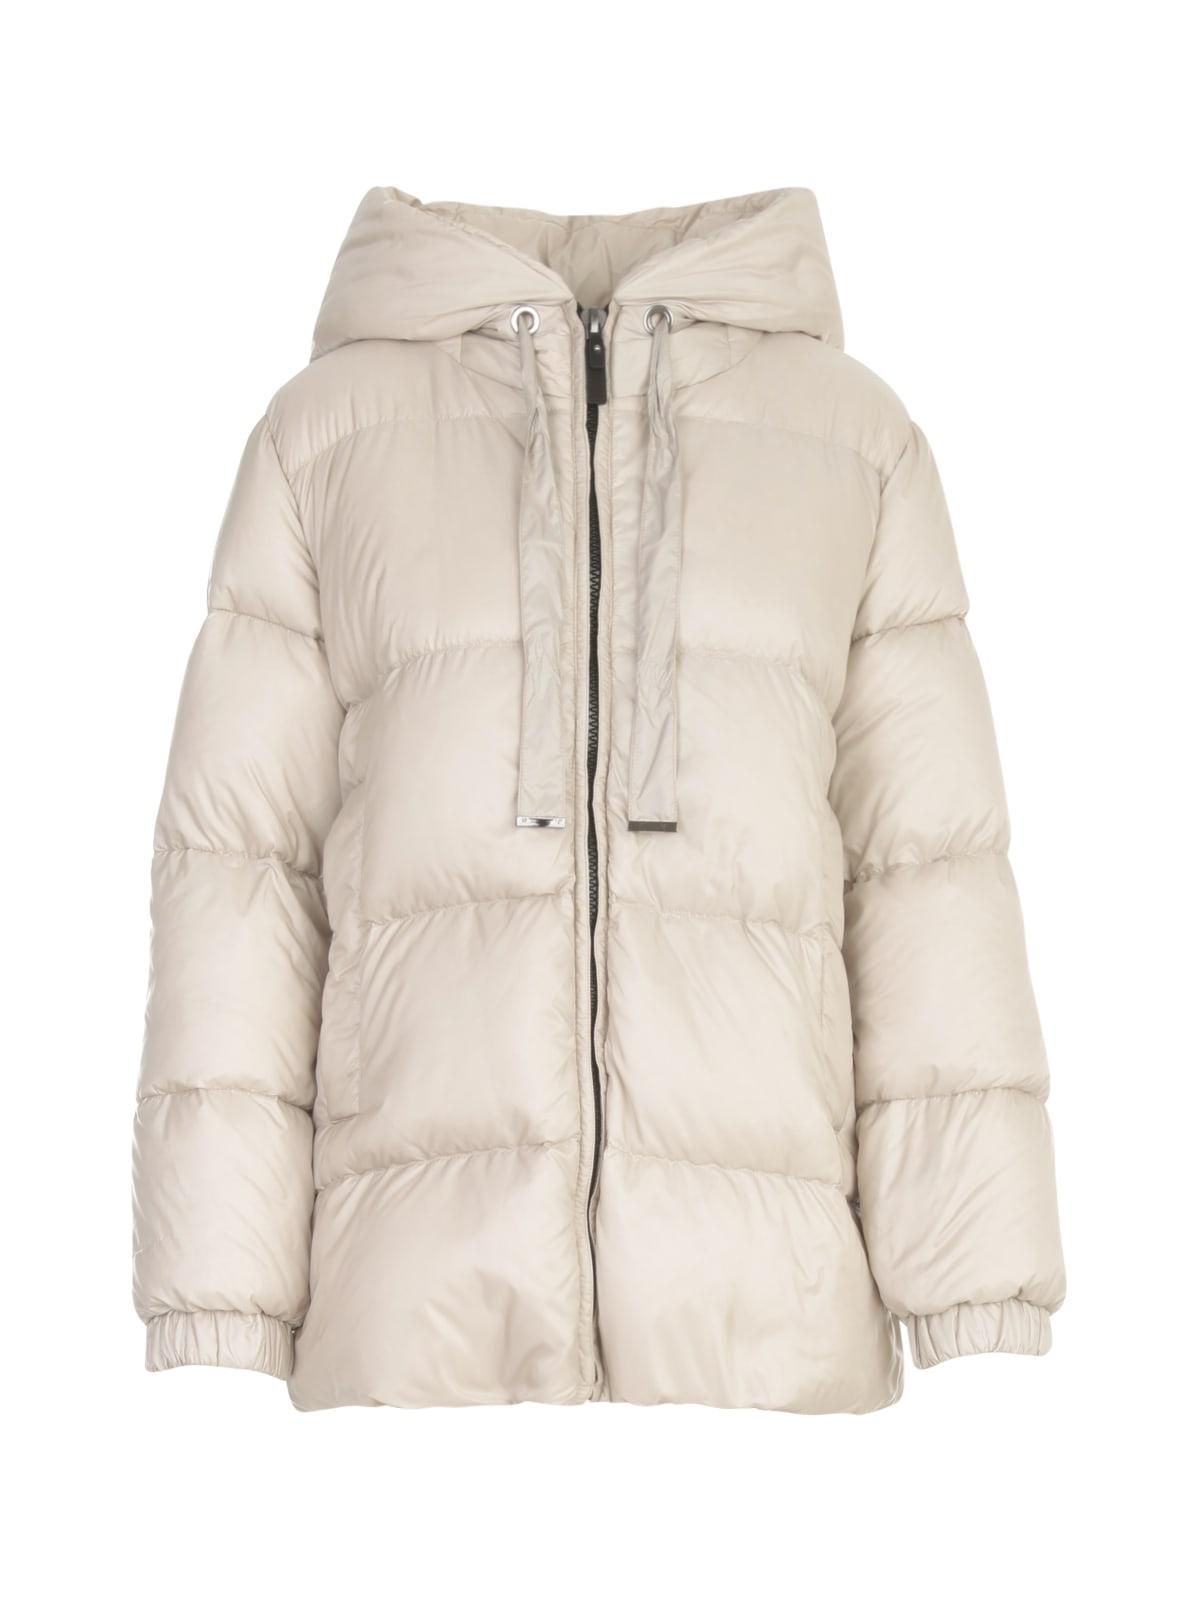 Seia Padded Jacket